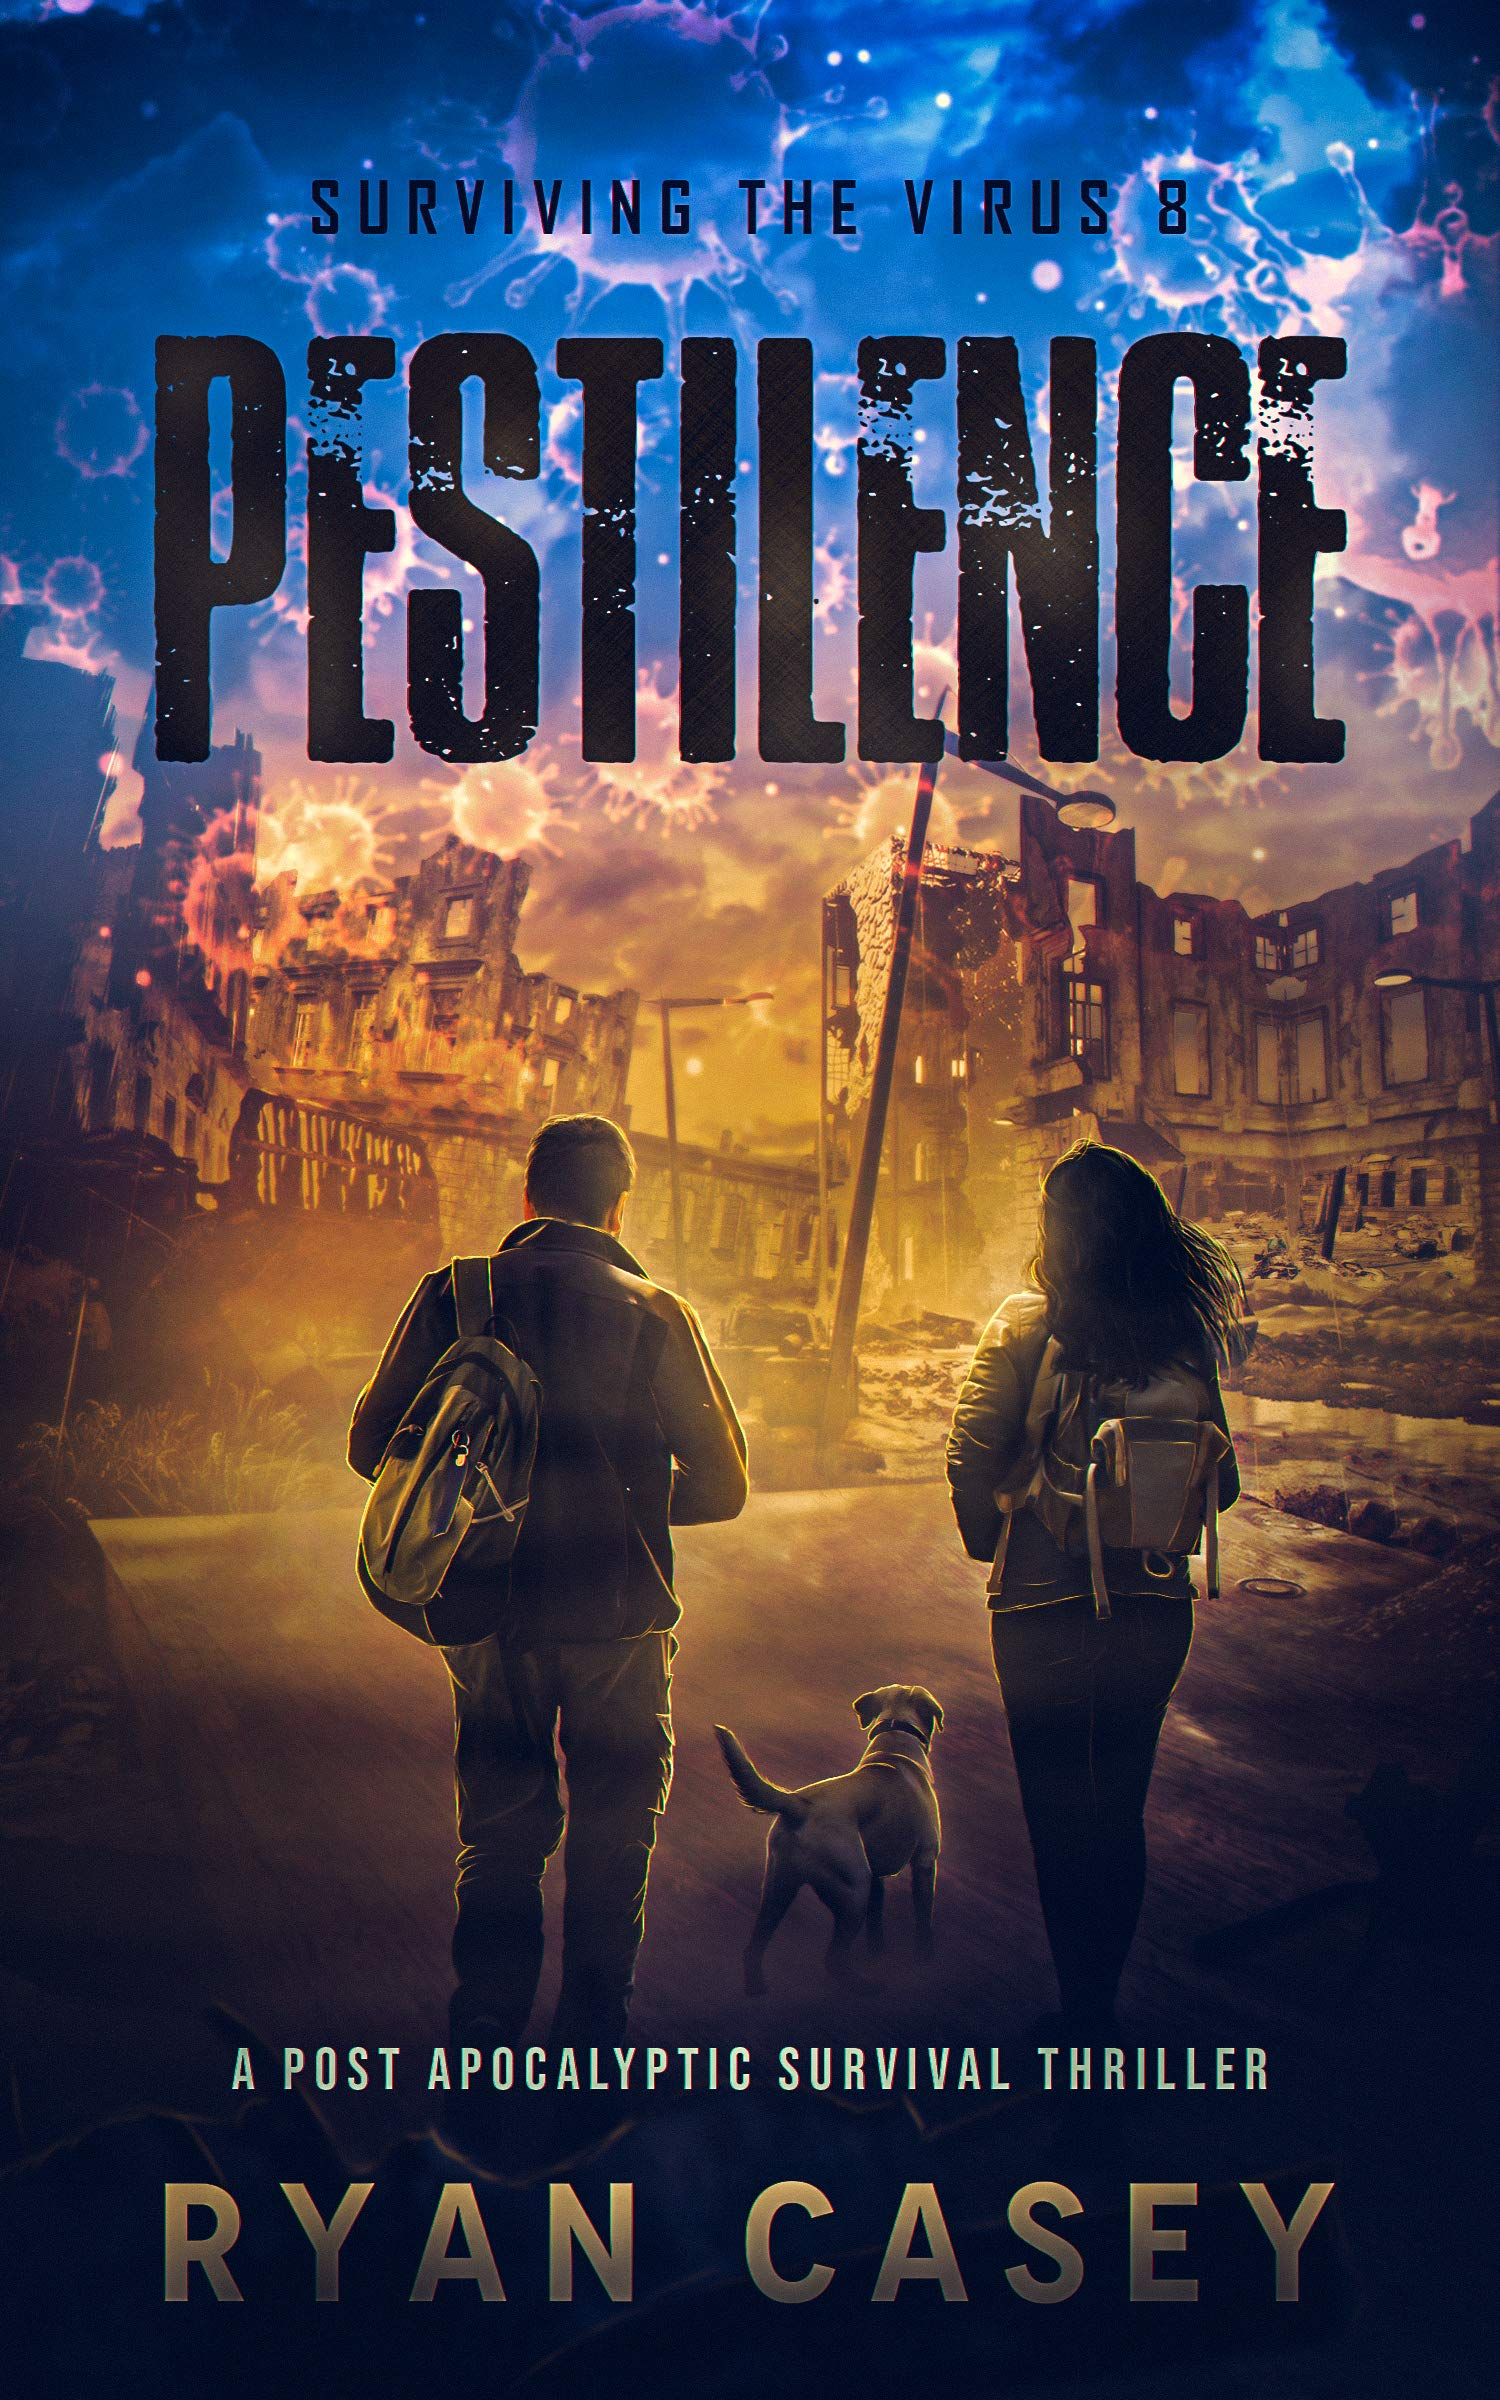 Pestilence: A Post Apocalyptic Survival Thriller (Surviving the Virus Book 8)